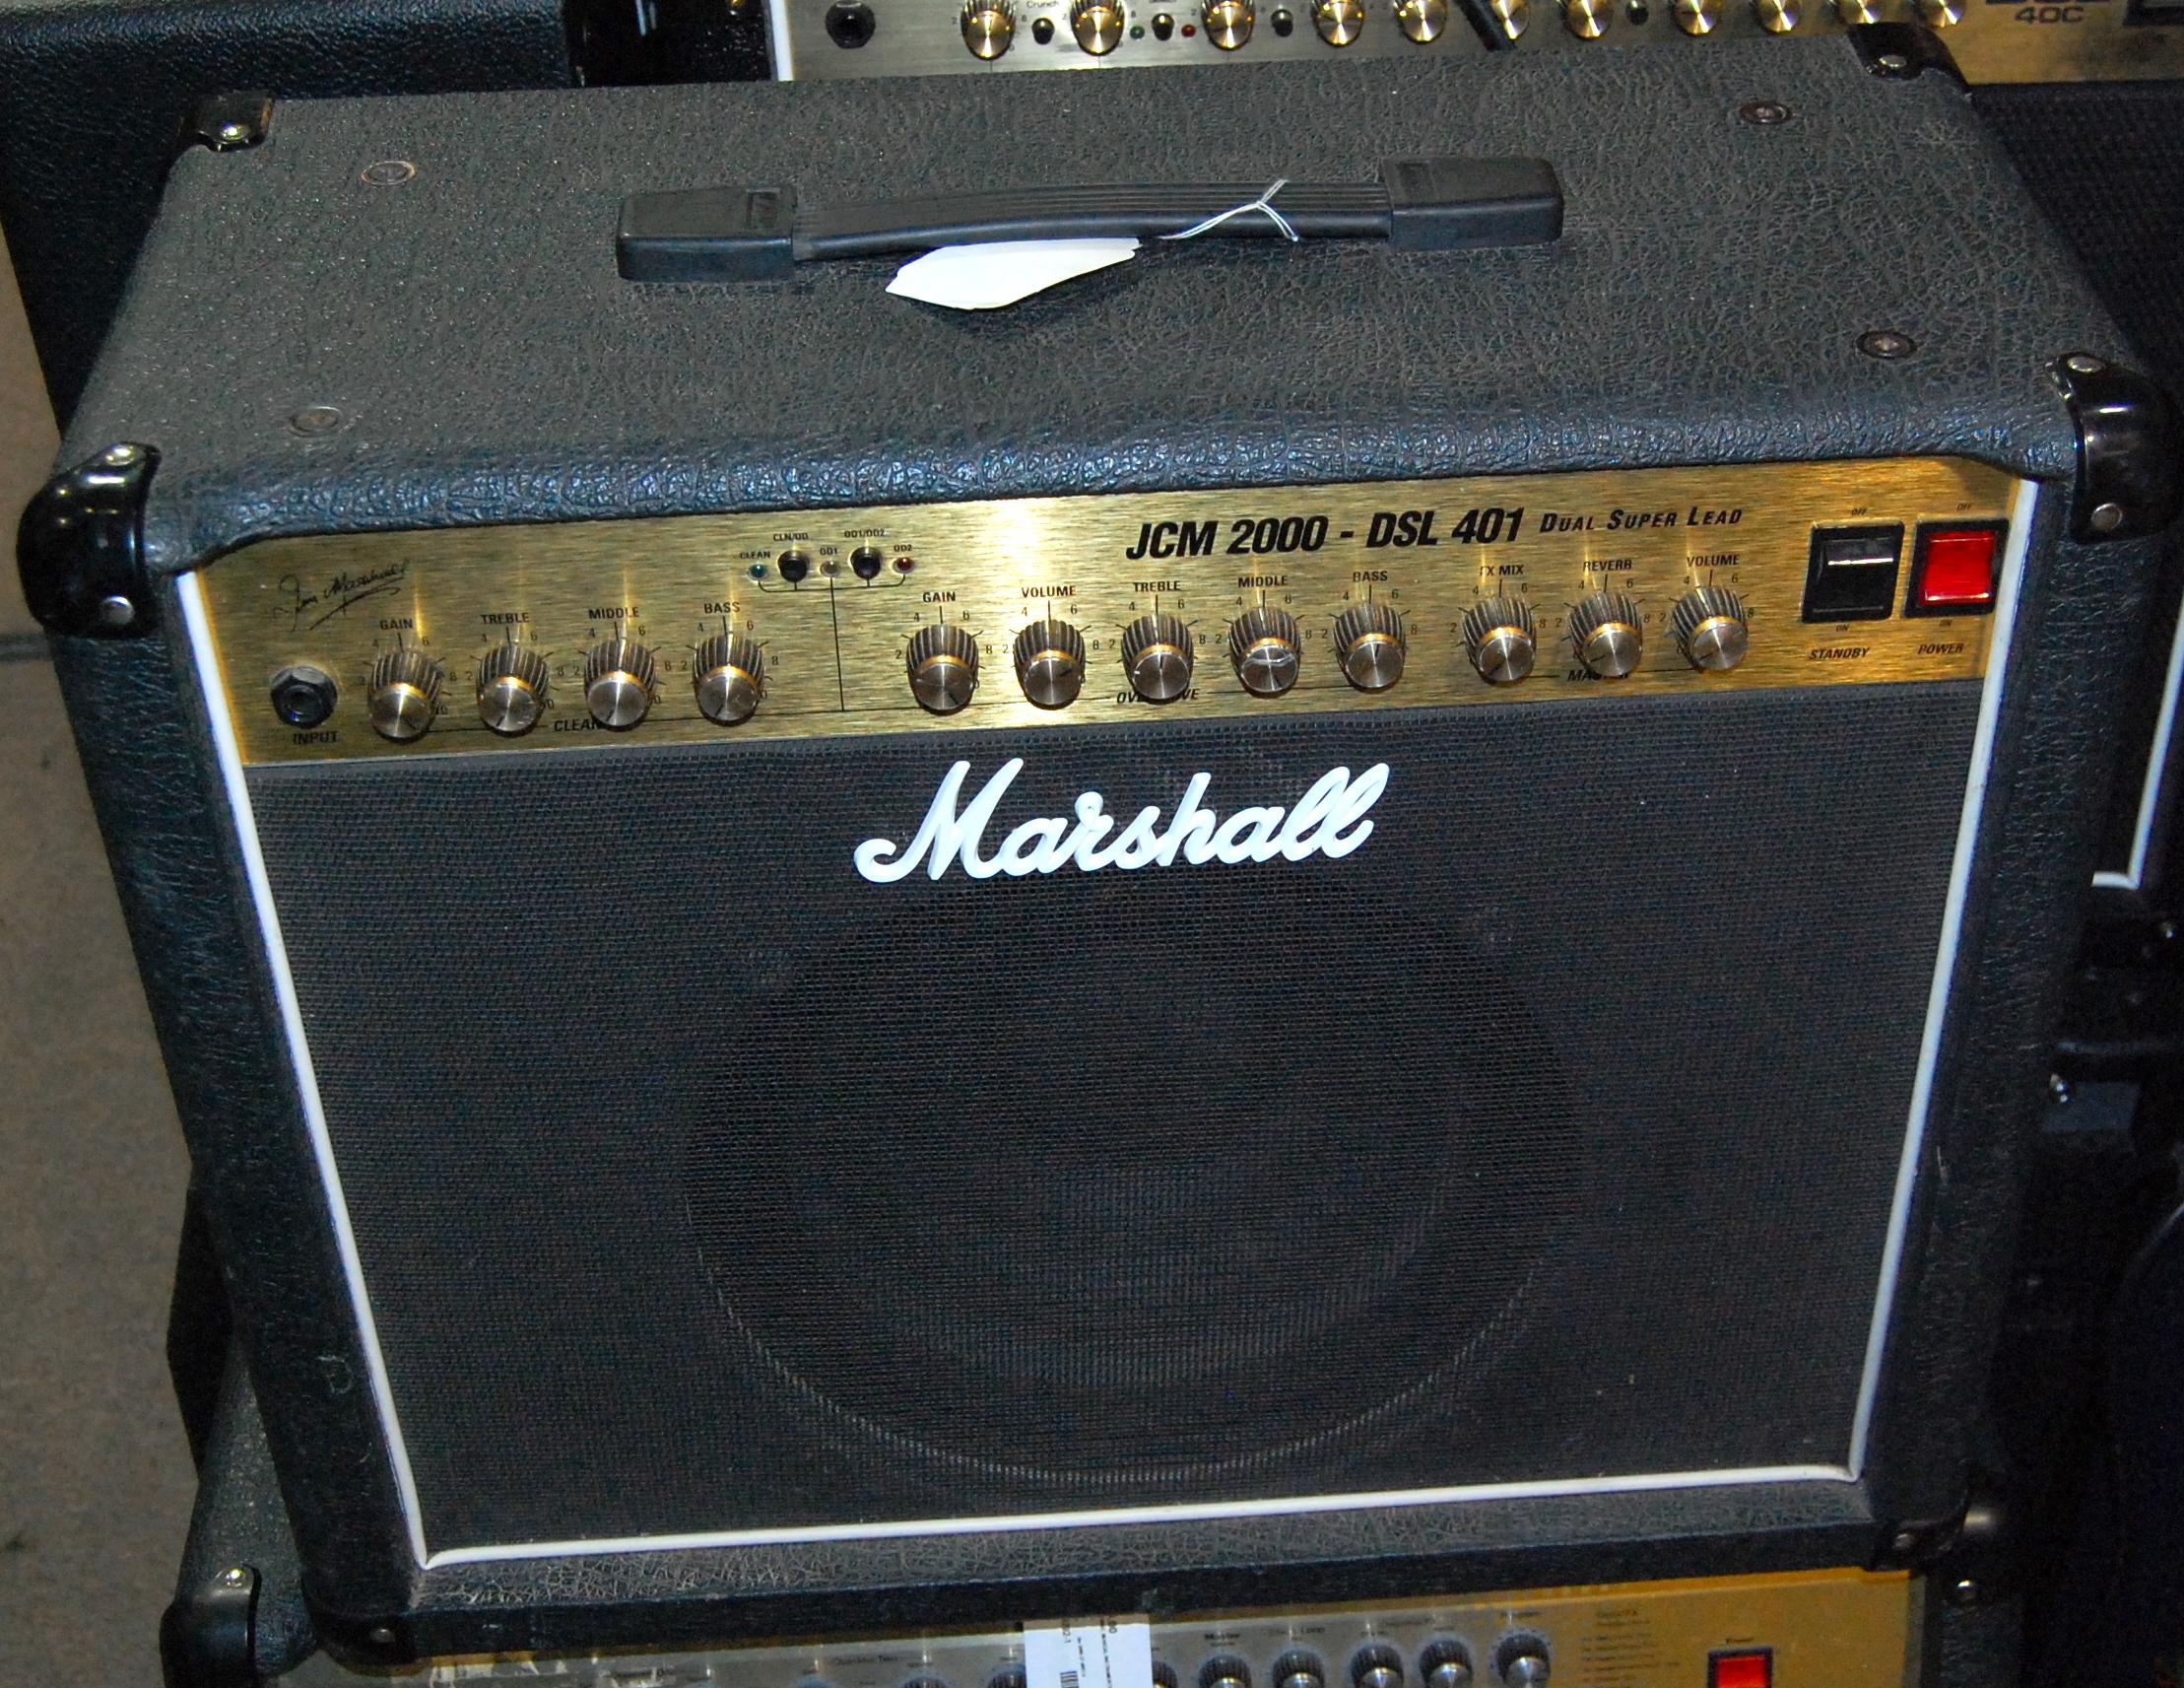 MARSHALL JCM2000 Dual Super Lead DSL401 JCM 2000 DSL 401 Tube Guitar Combo Amplifier Amp